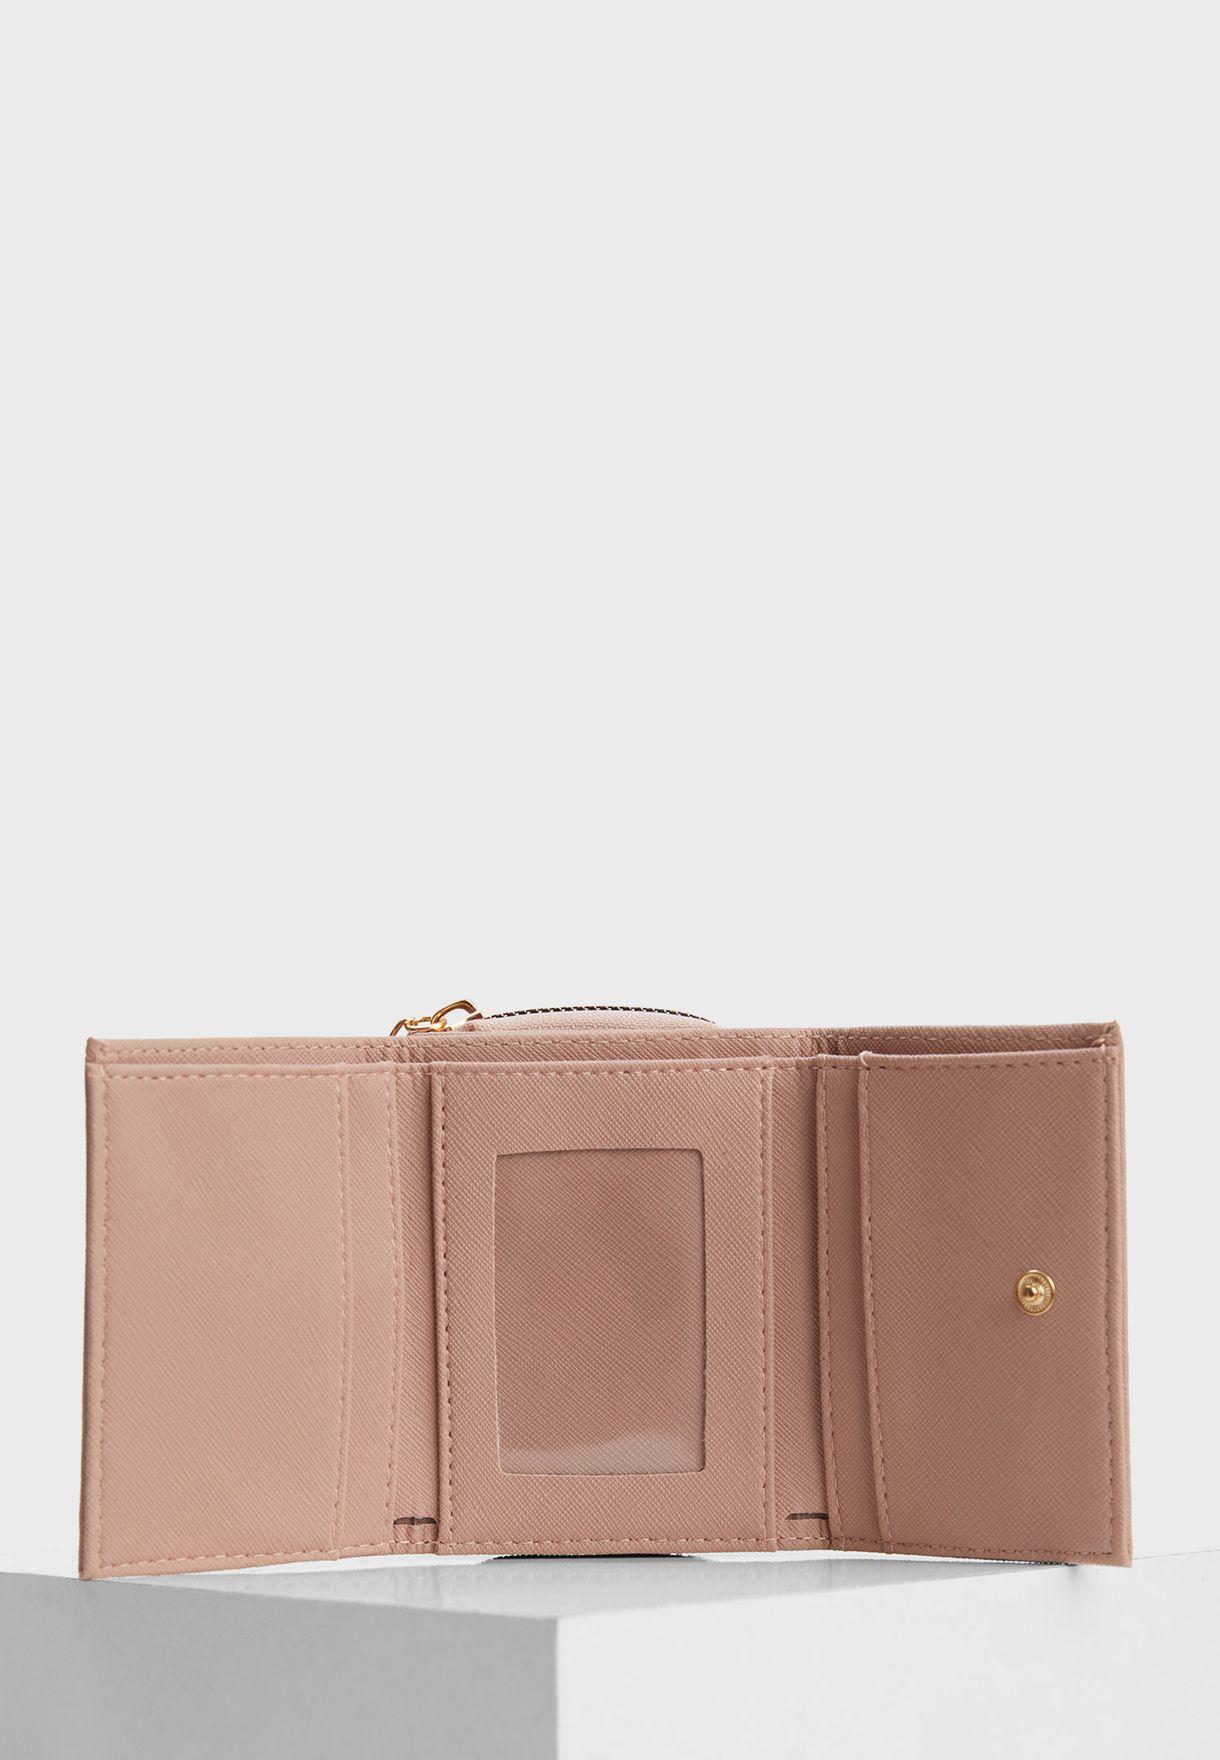 flap over purses